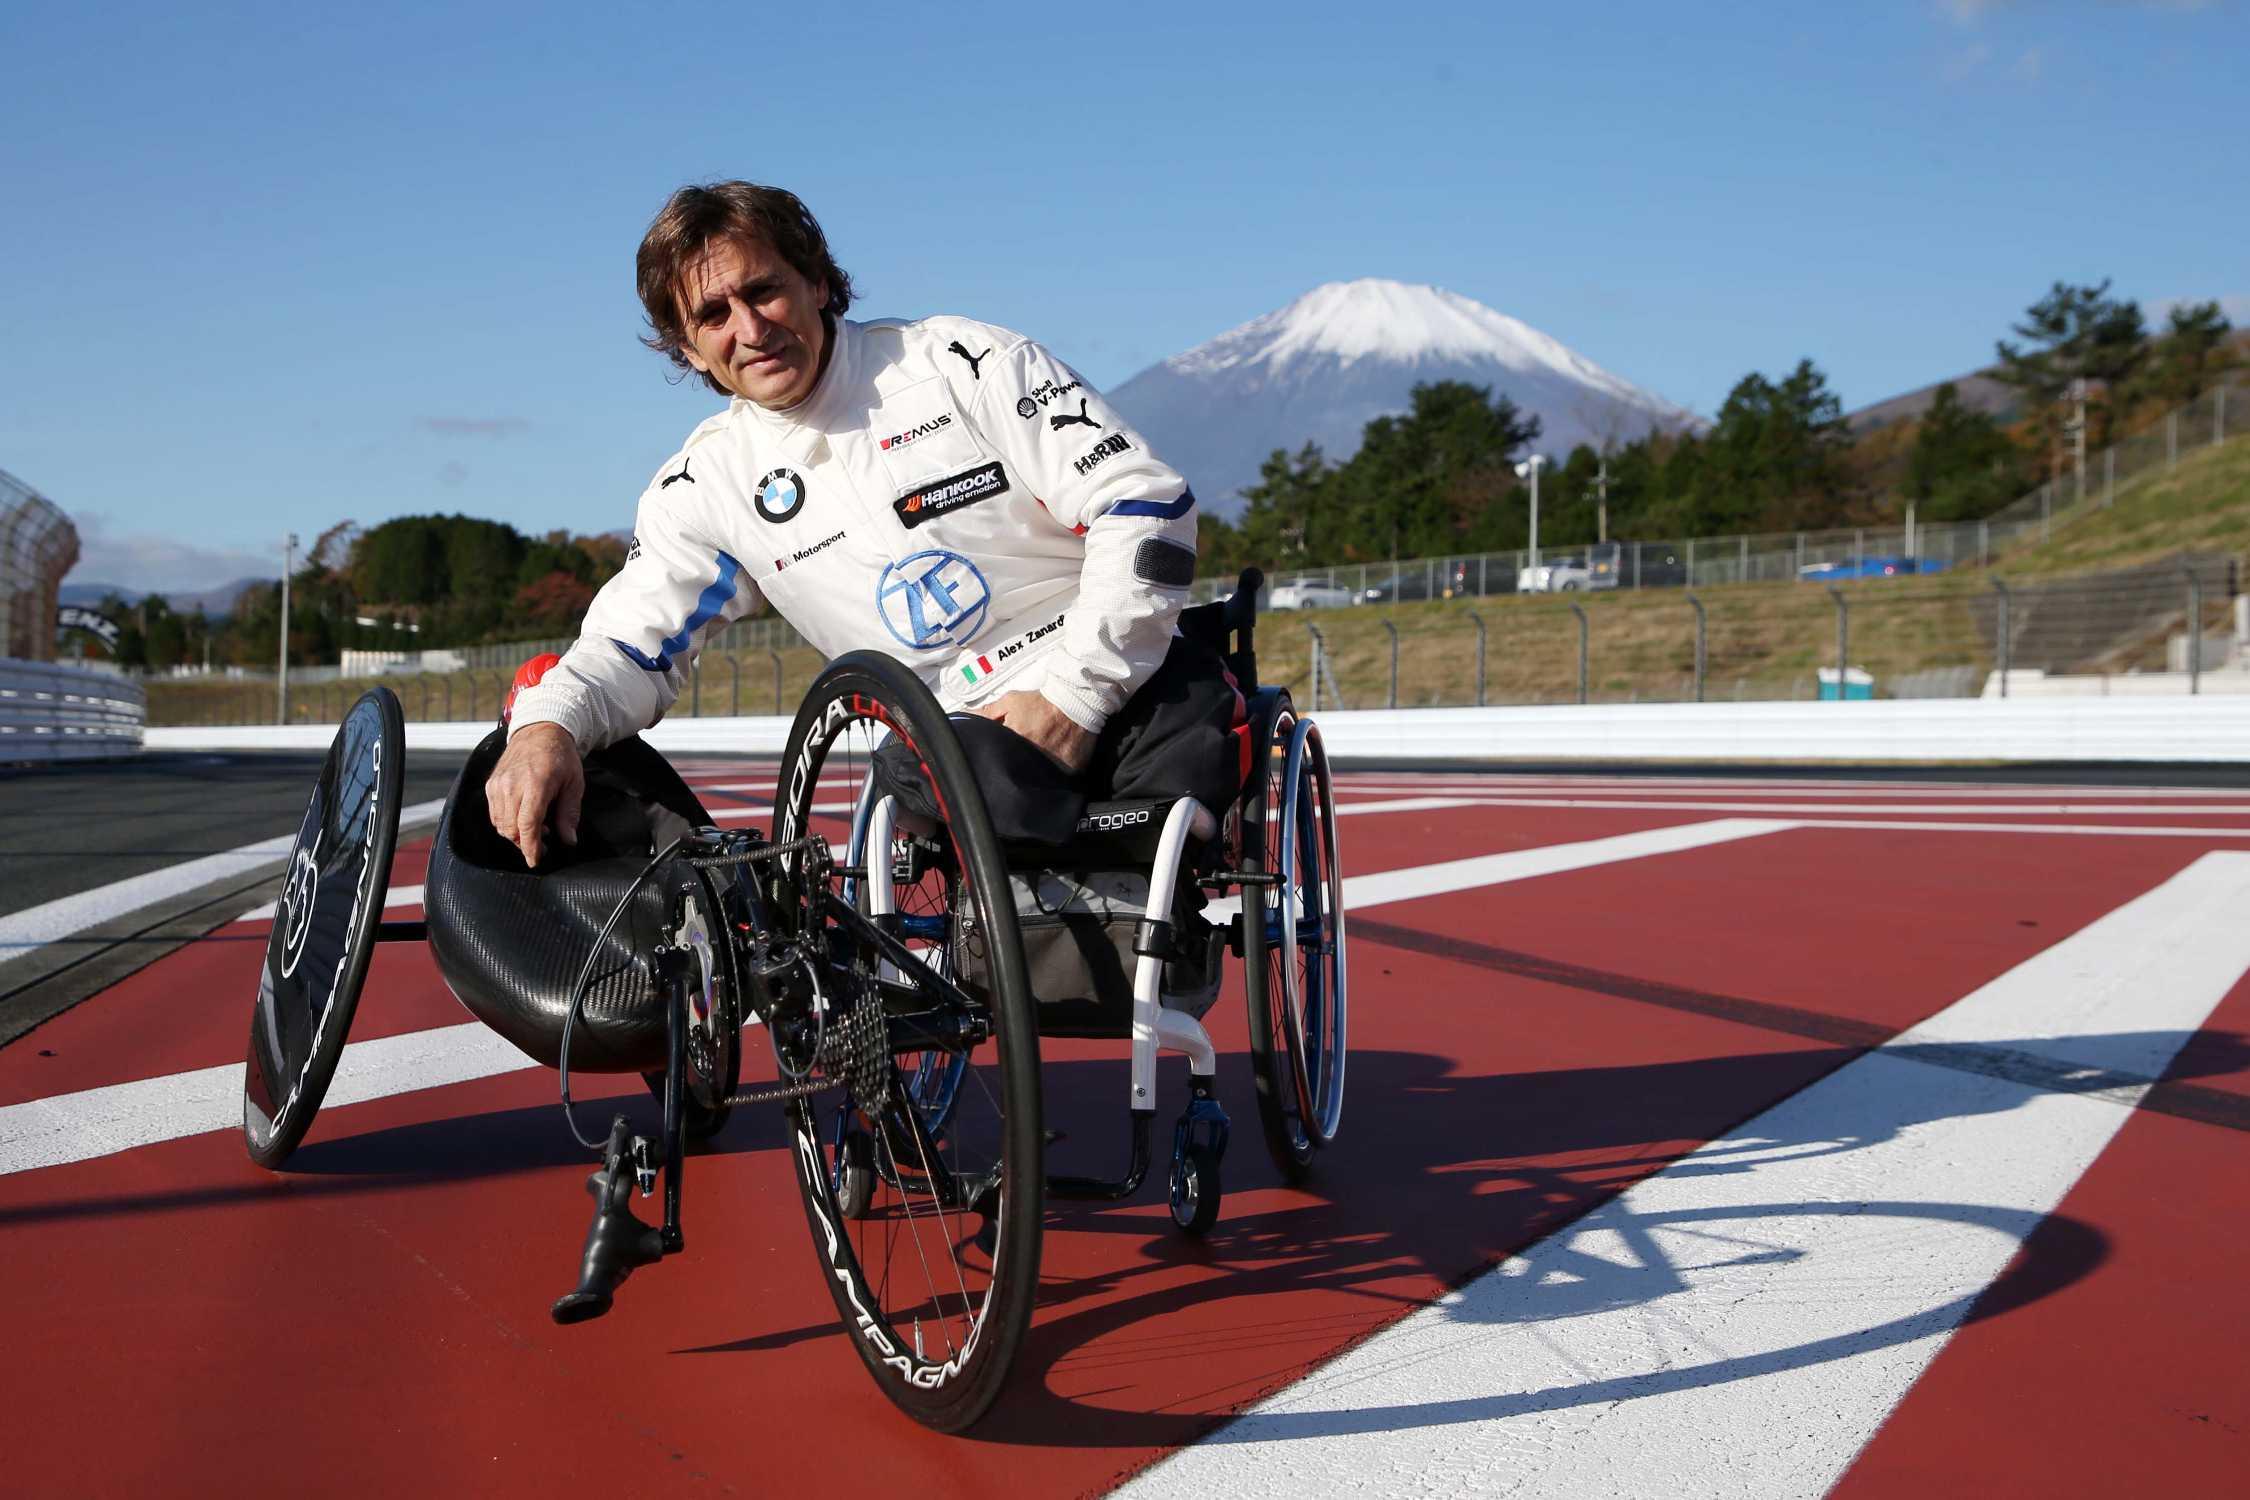 Mission Tokyo 2020: Alessandro Zanardi takes to the Fuji track ...